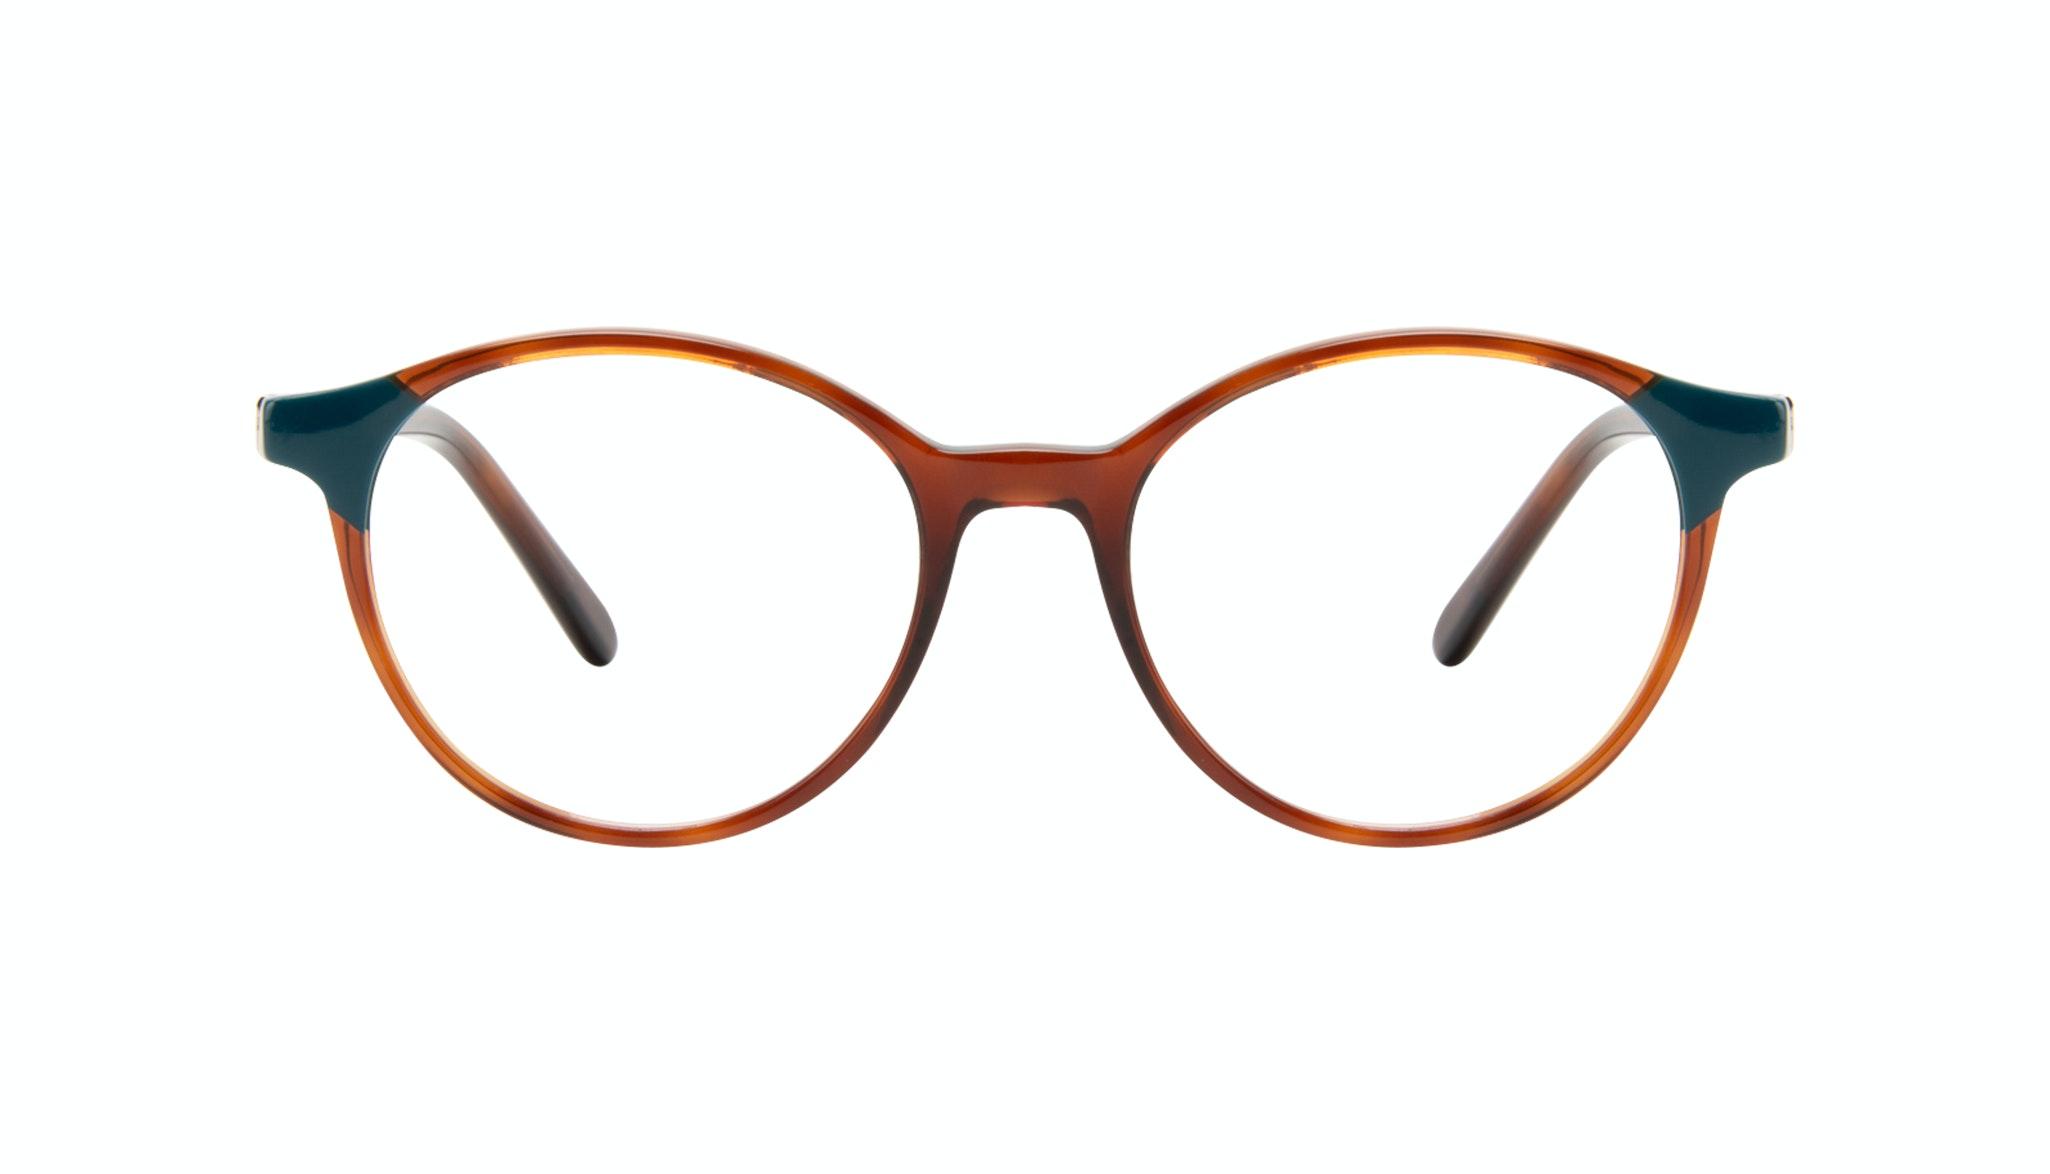 Affordable Fashion Glasses Round Eyeglasses Women Vivid Teal Tort Front